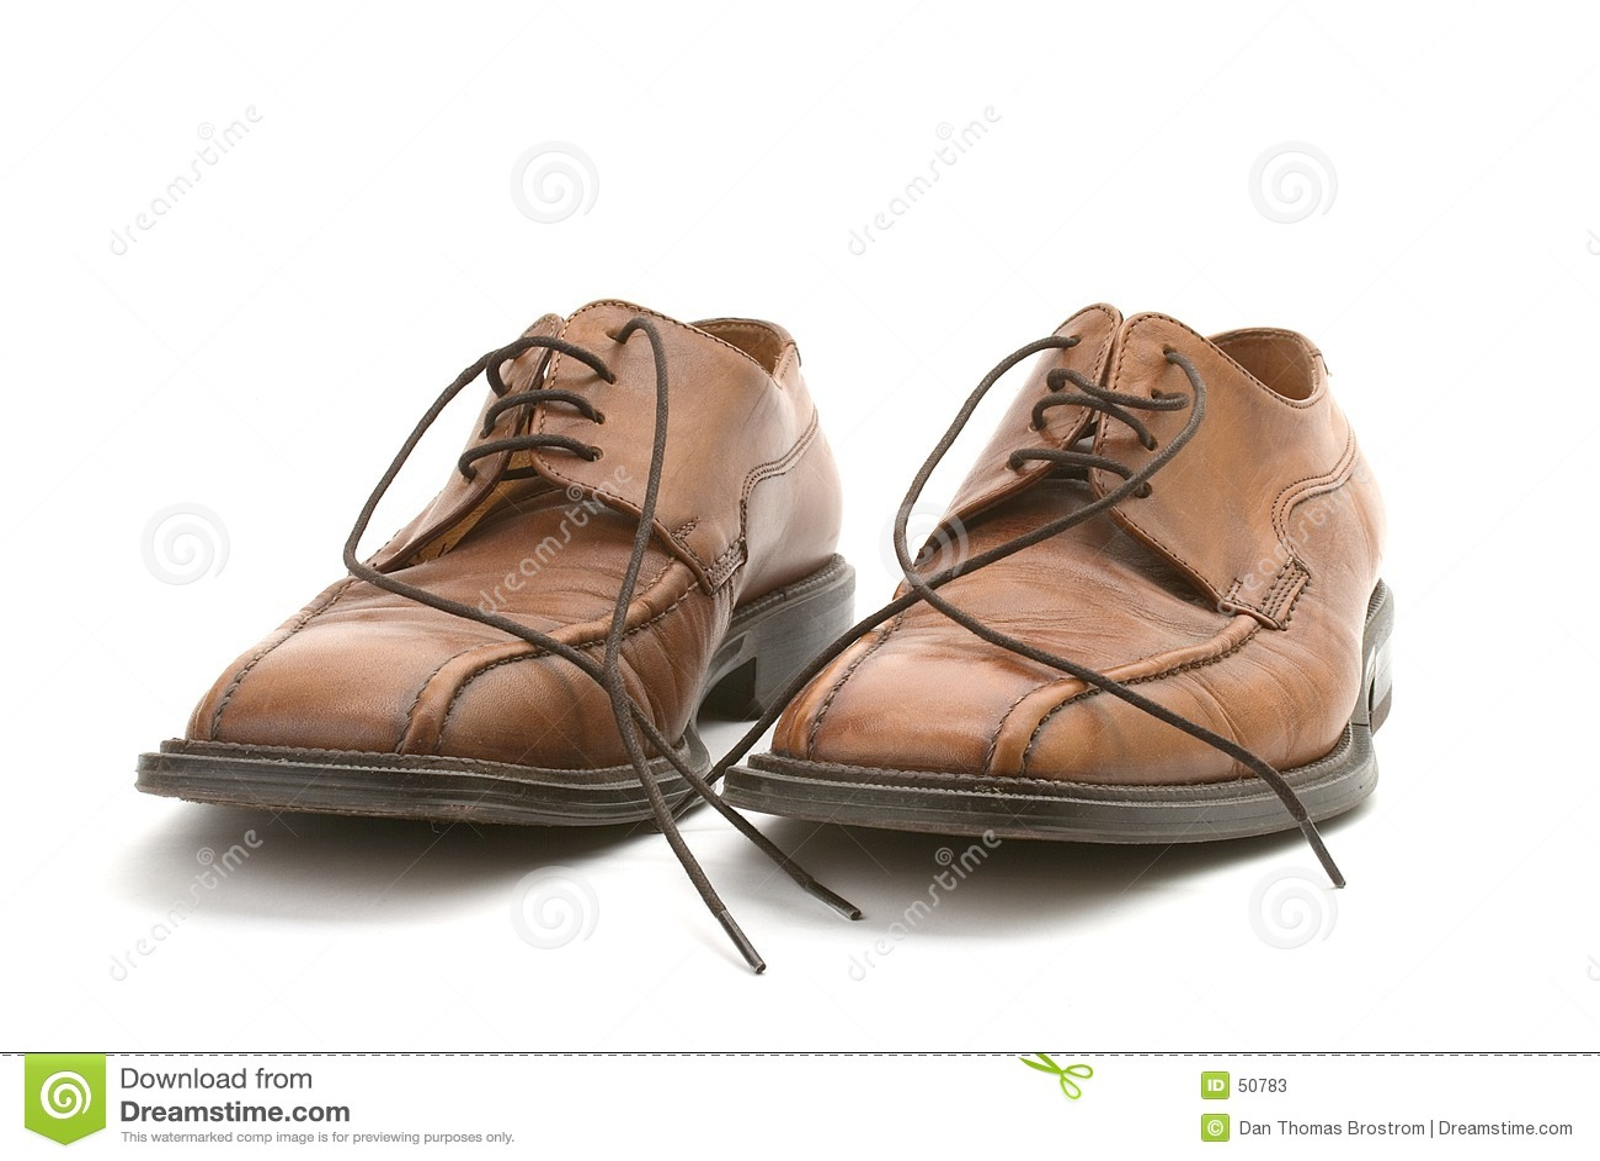 Download Chaussures image stock. Image du mode, cordonnier, italien - 50783